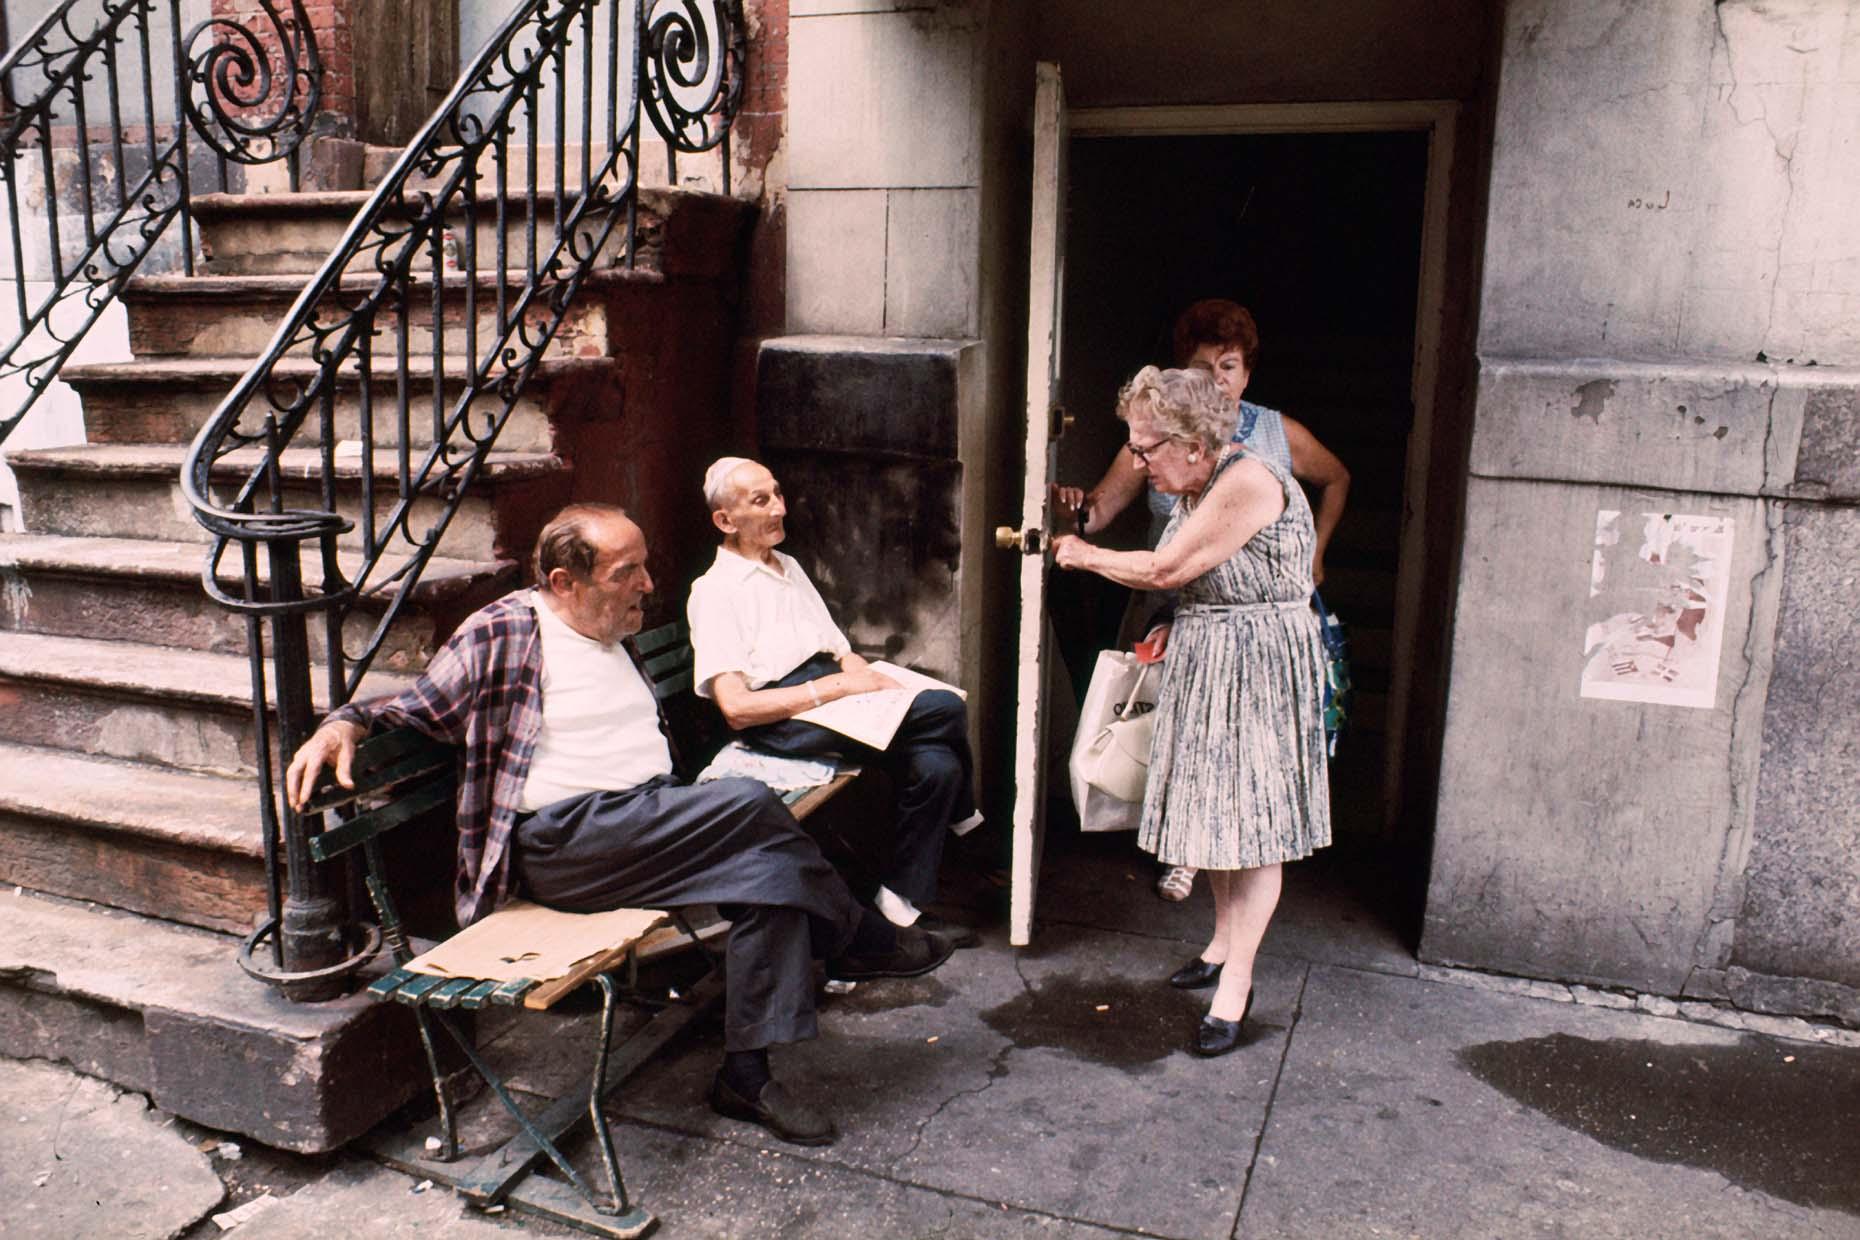 19_Lower East Side, Manhattan, 1970_-DUP3